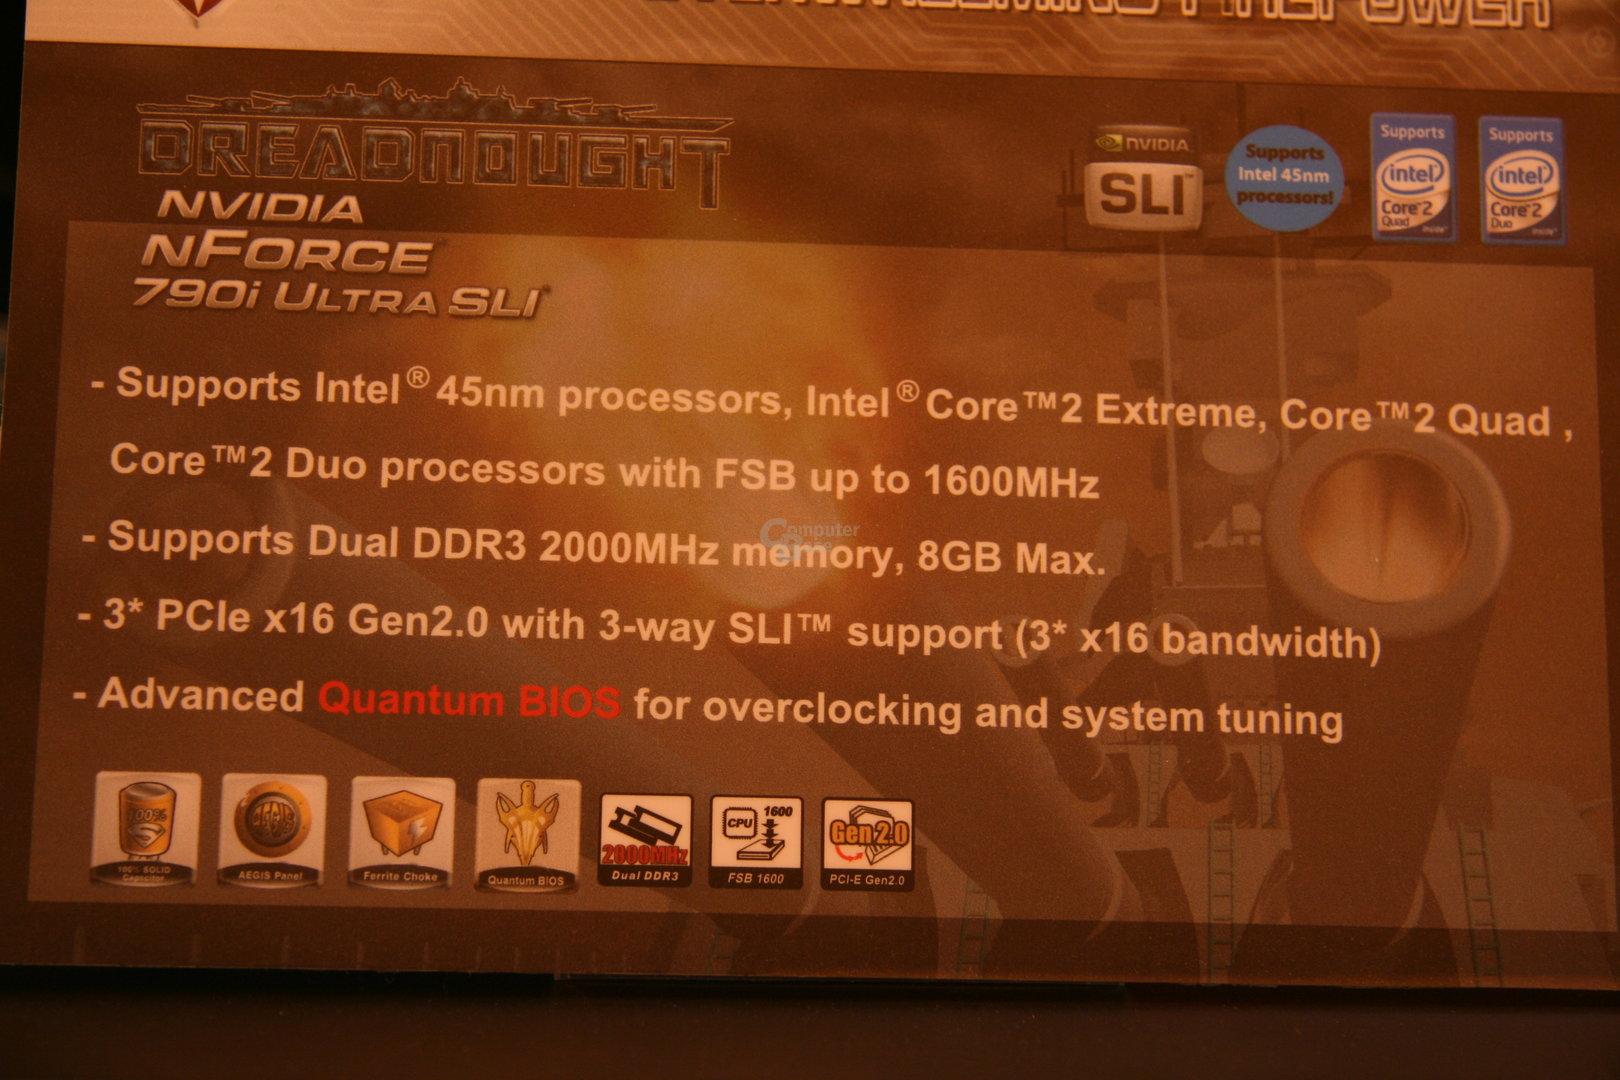 Foxconn GeForce 9800 GX2 Benchmark